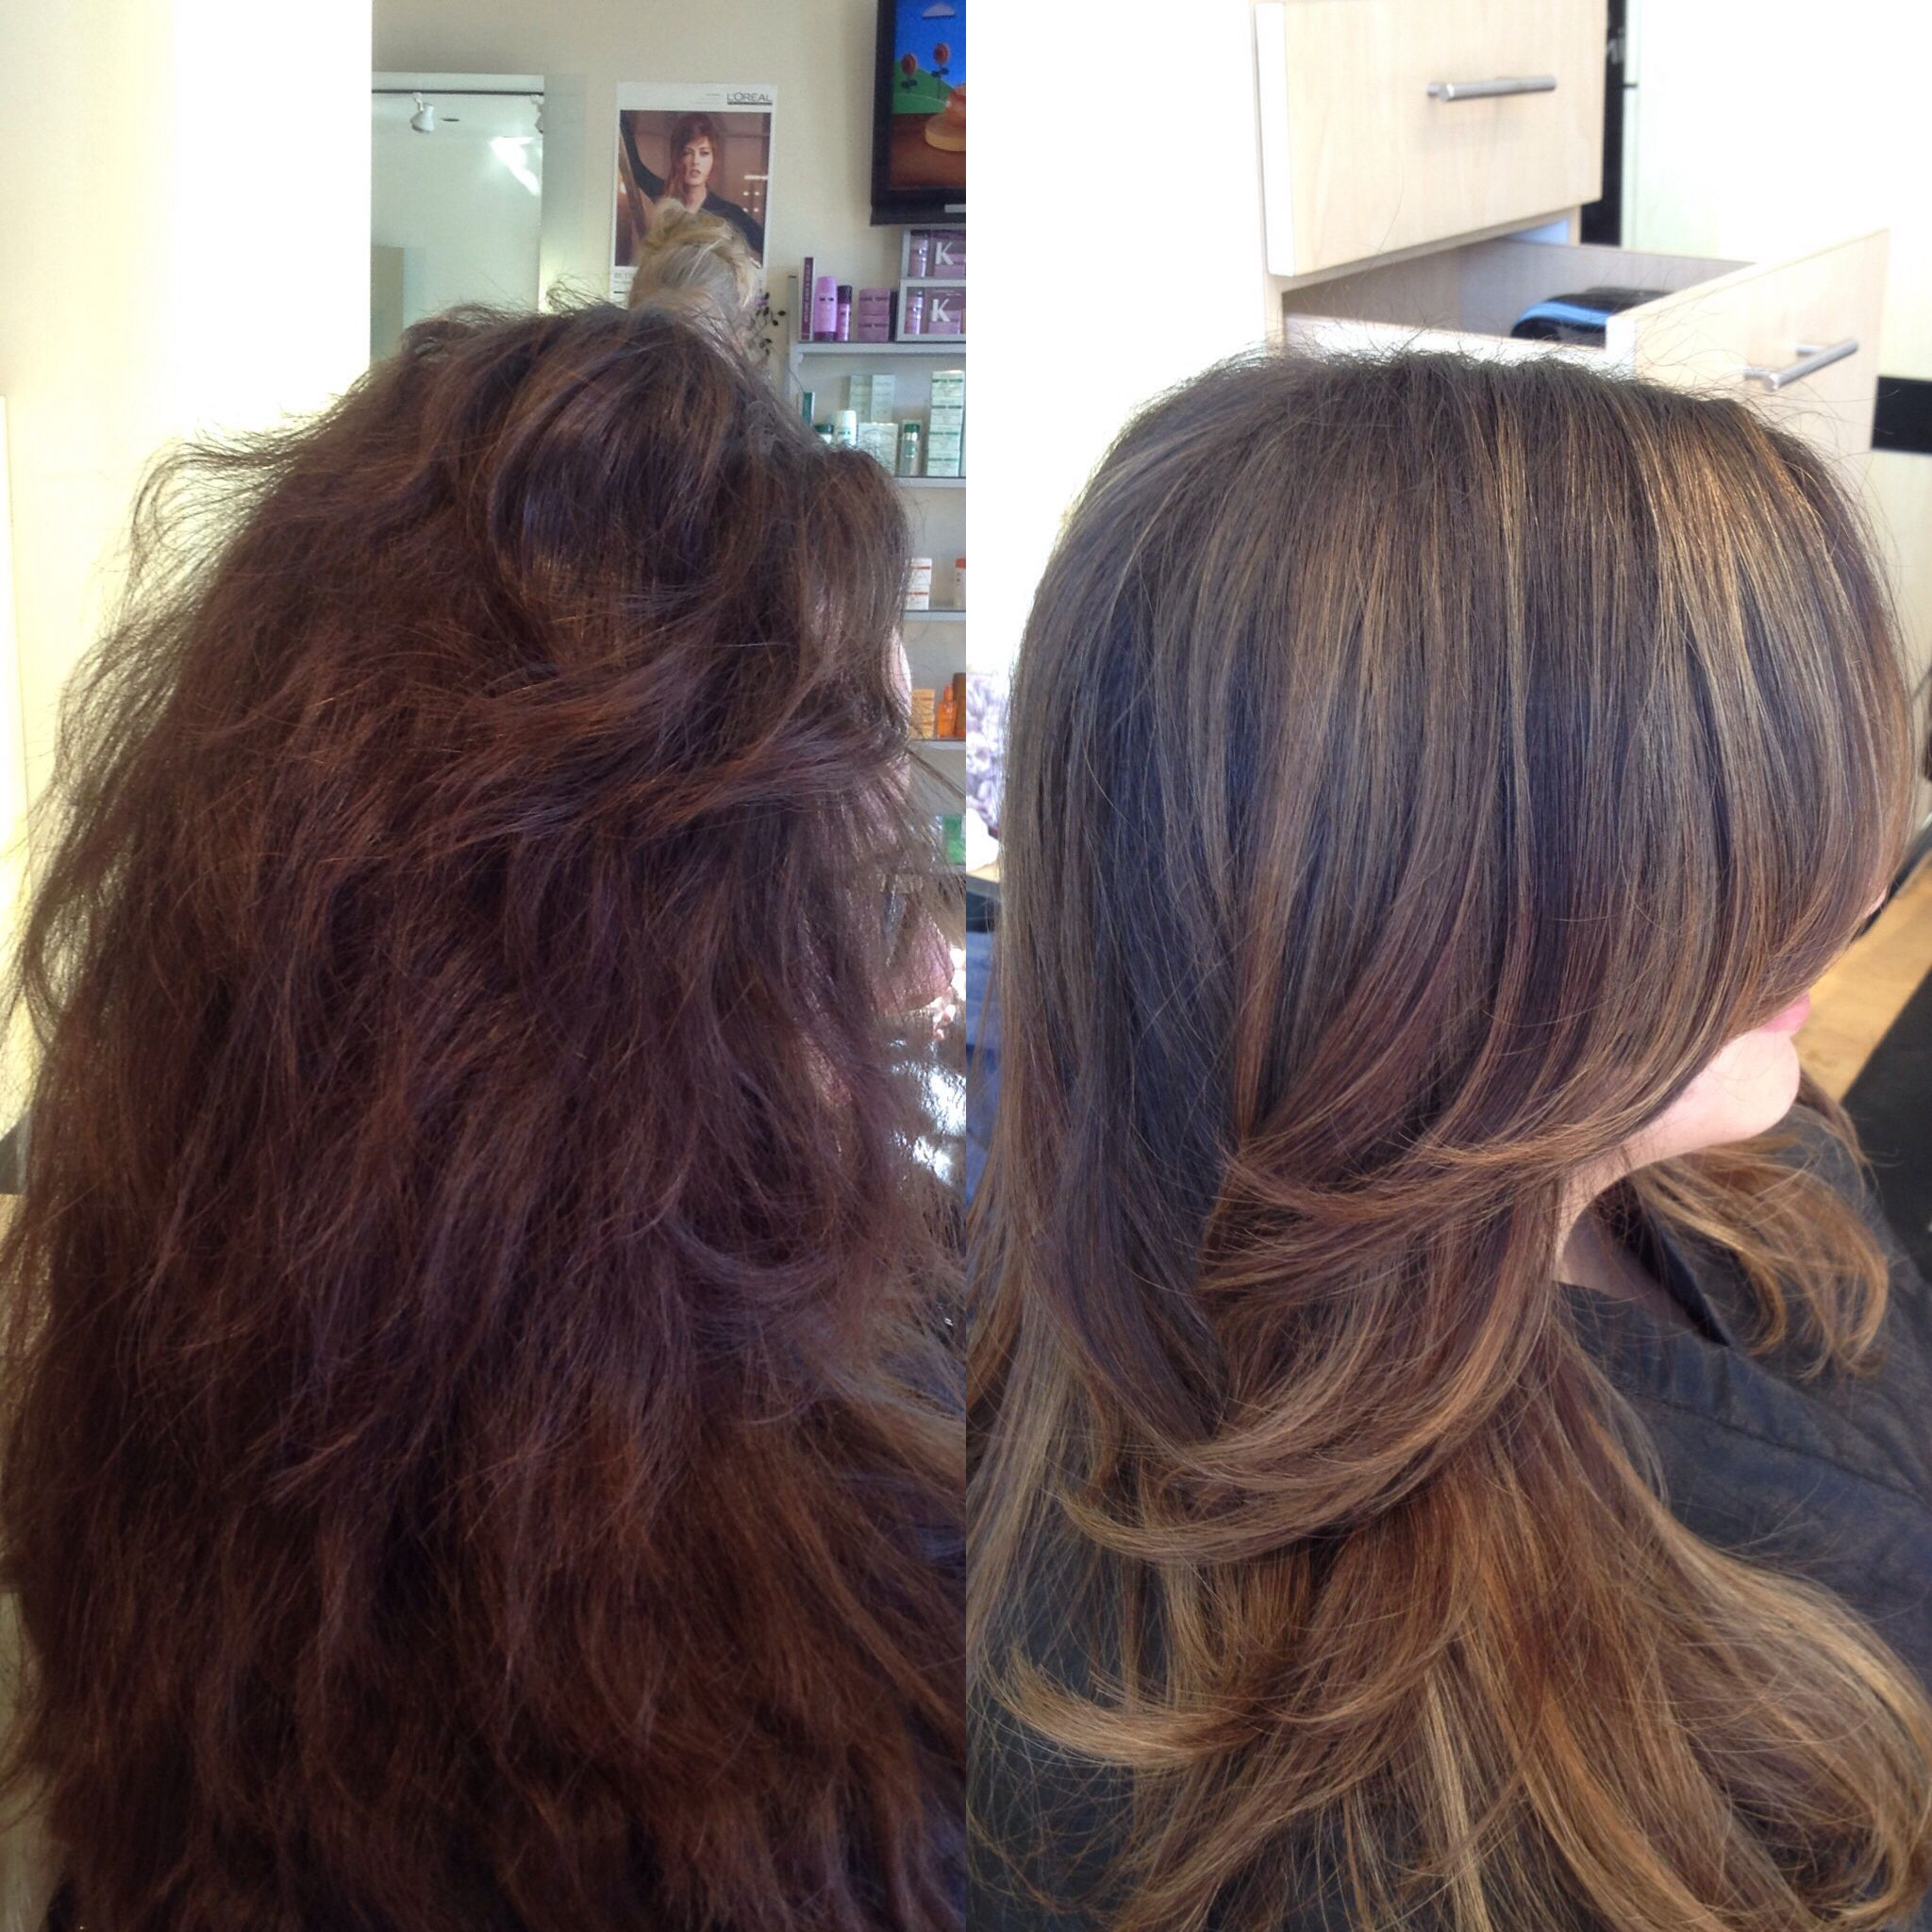 Balayage Melt Haircut And Smooth Blowdry Hair By Danni Sjoden At